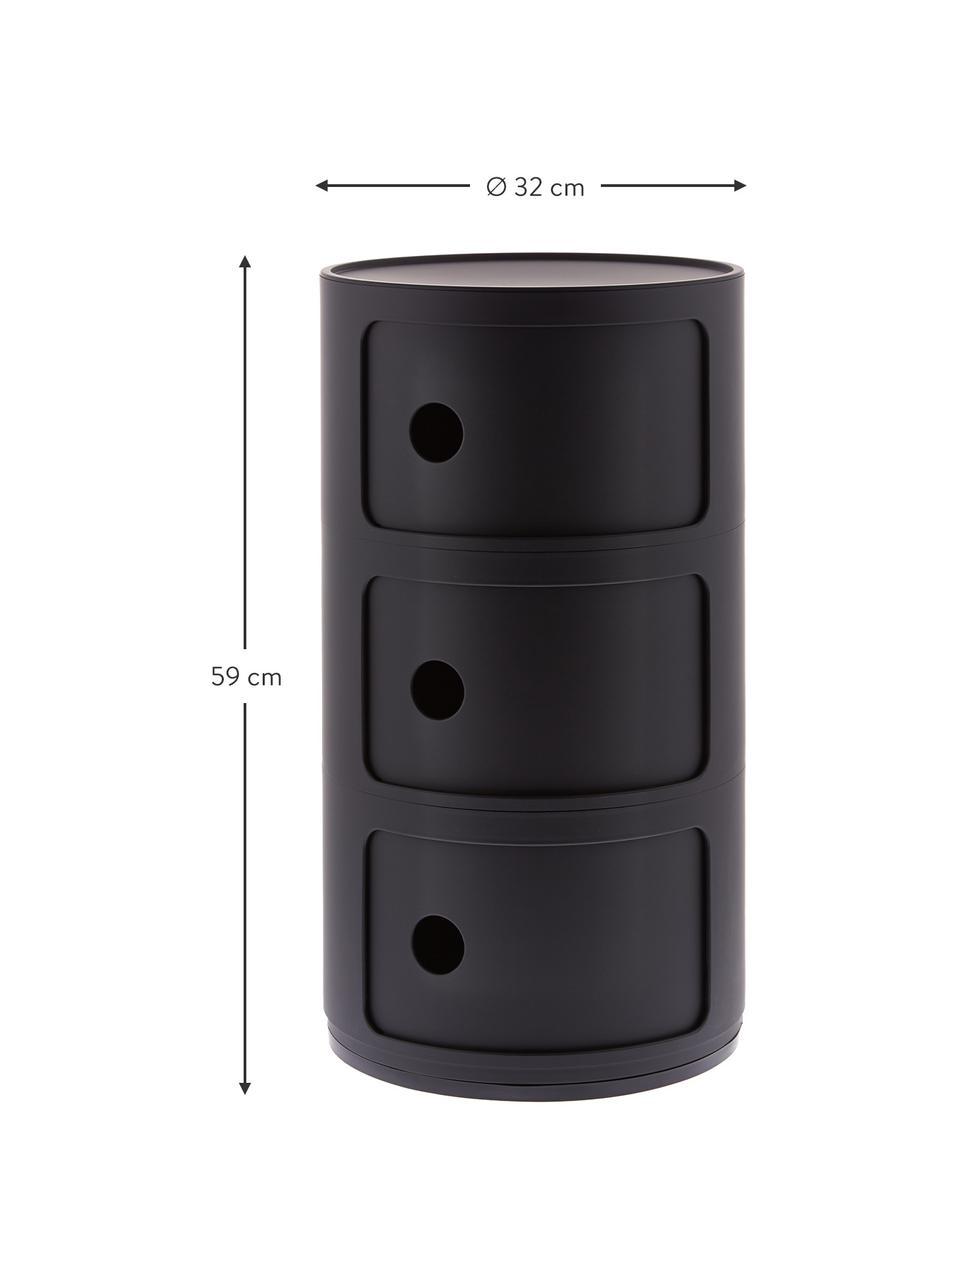 Design bijzettafel Componibile, 3 vakken, Gelakt kunststof (ABS), Mat zwart, Ø 32 x H 59 cm